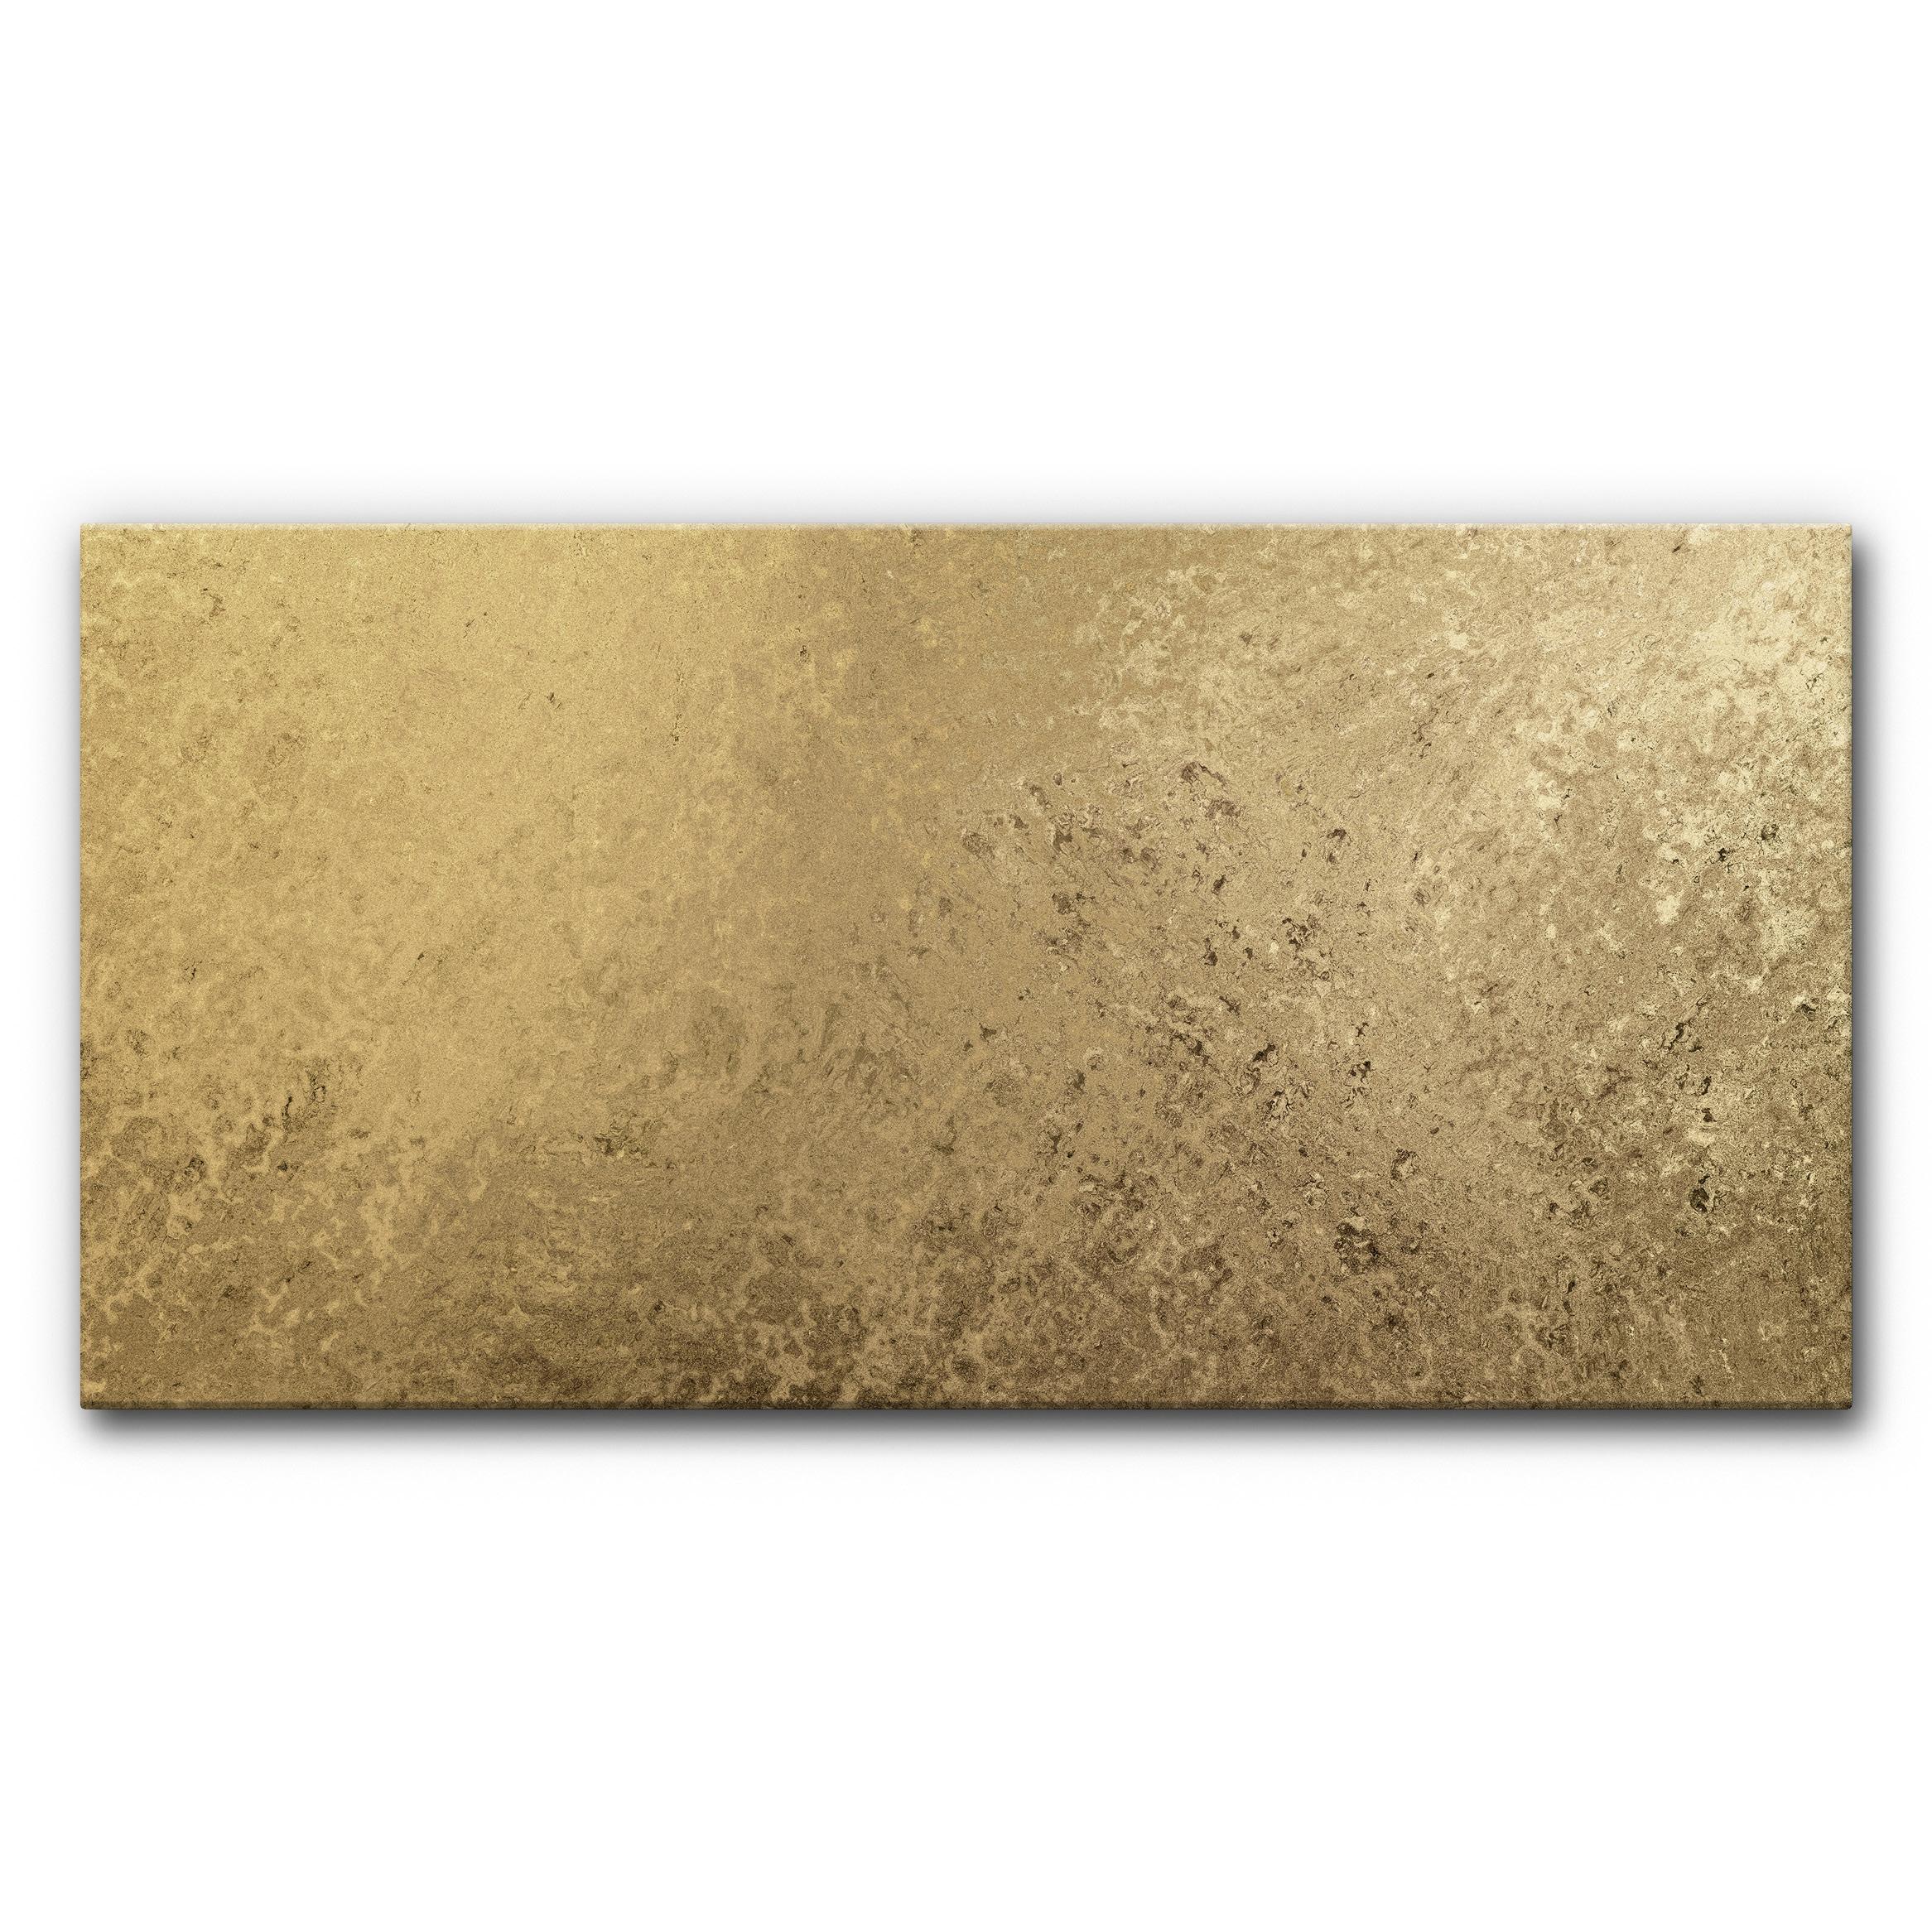 akustikbilder raumakustik verbessern buero besprechungsraum hallt wandbild gold kupfer metall. Black Bedroom Furniture Sets. Home Design Ideas